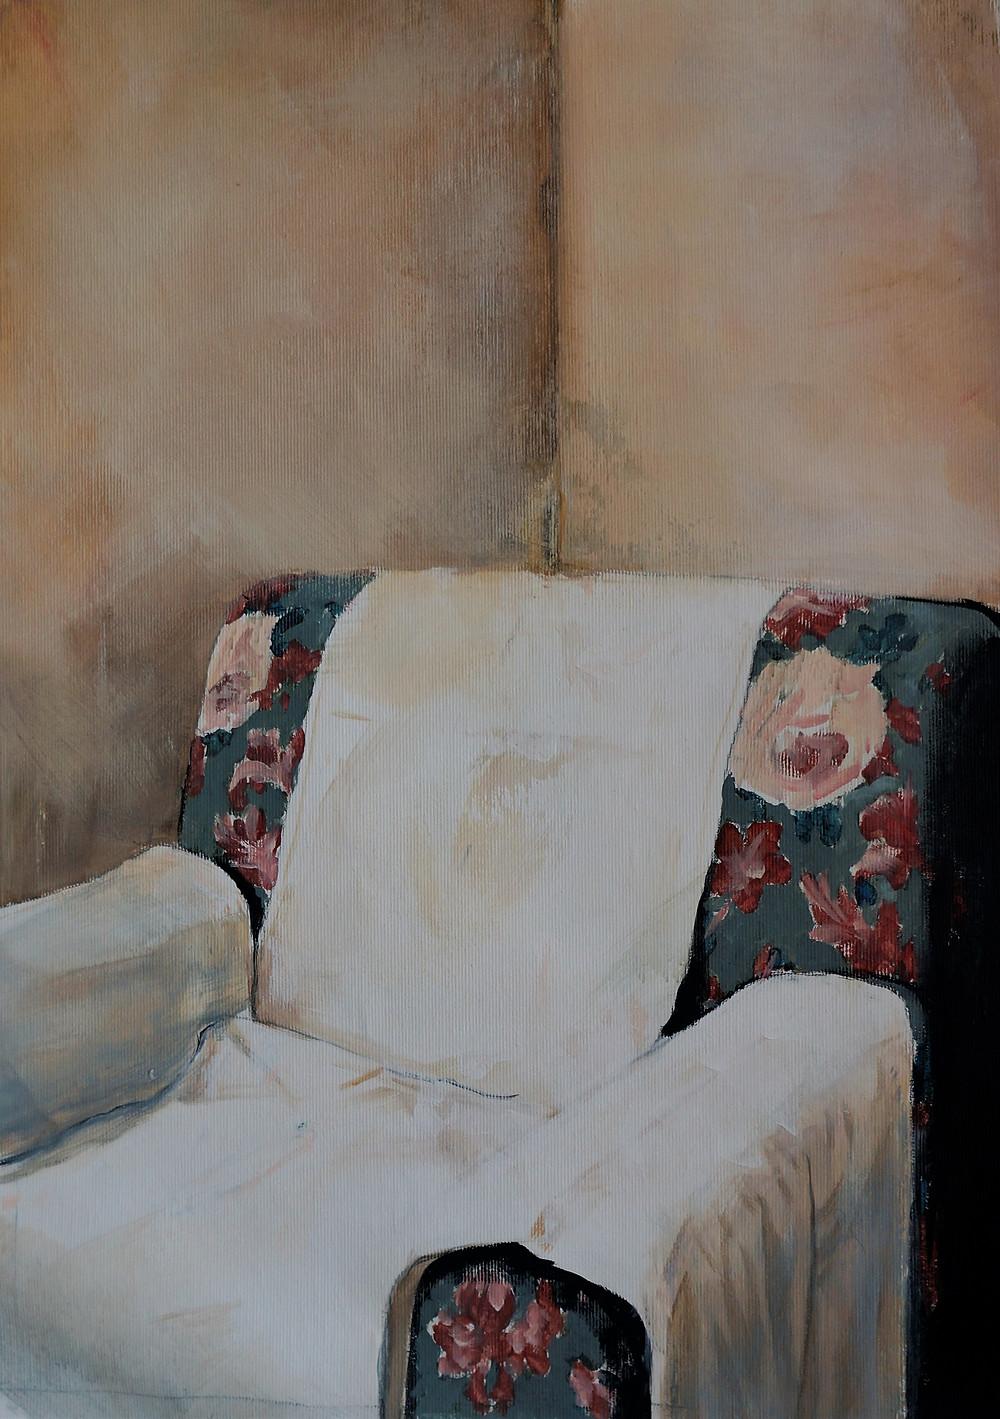 The healing spot - Stefan Doru Moscu